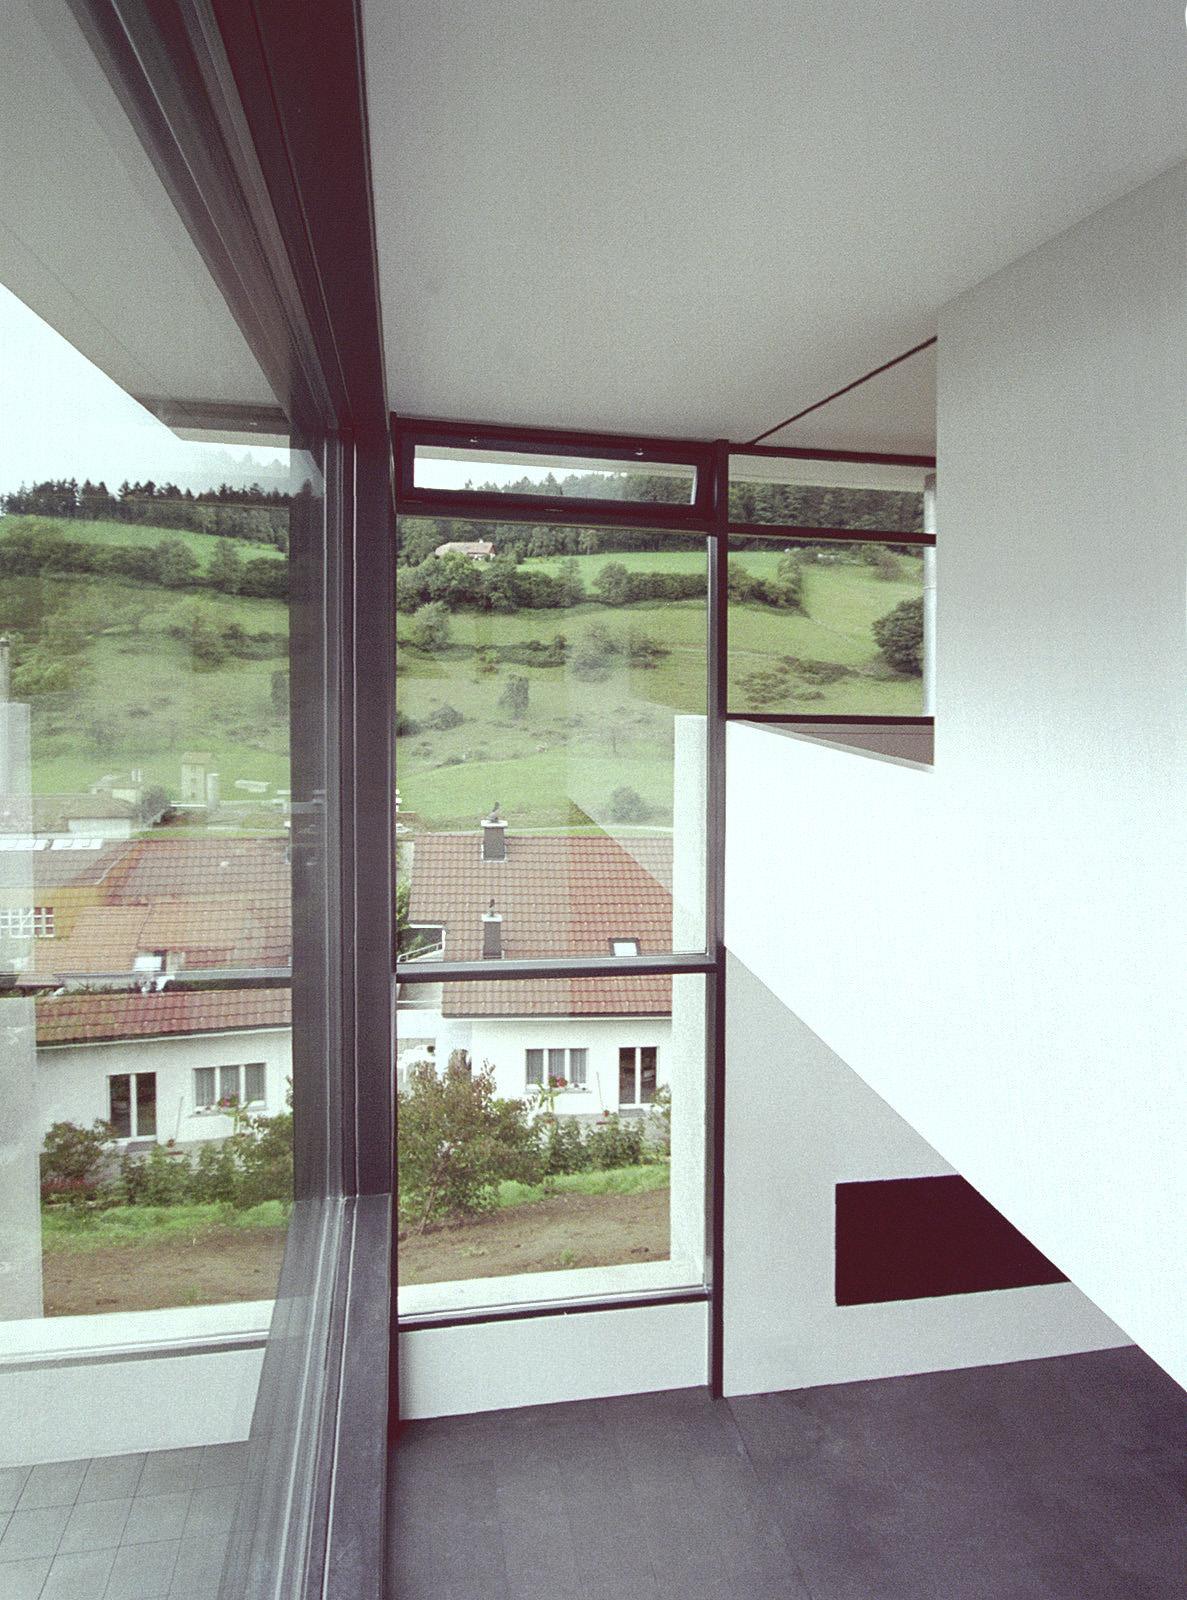 9915 Haus Mohrenacher